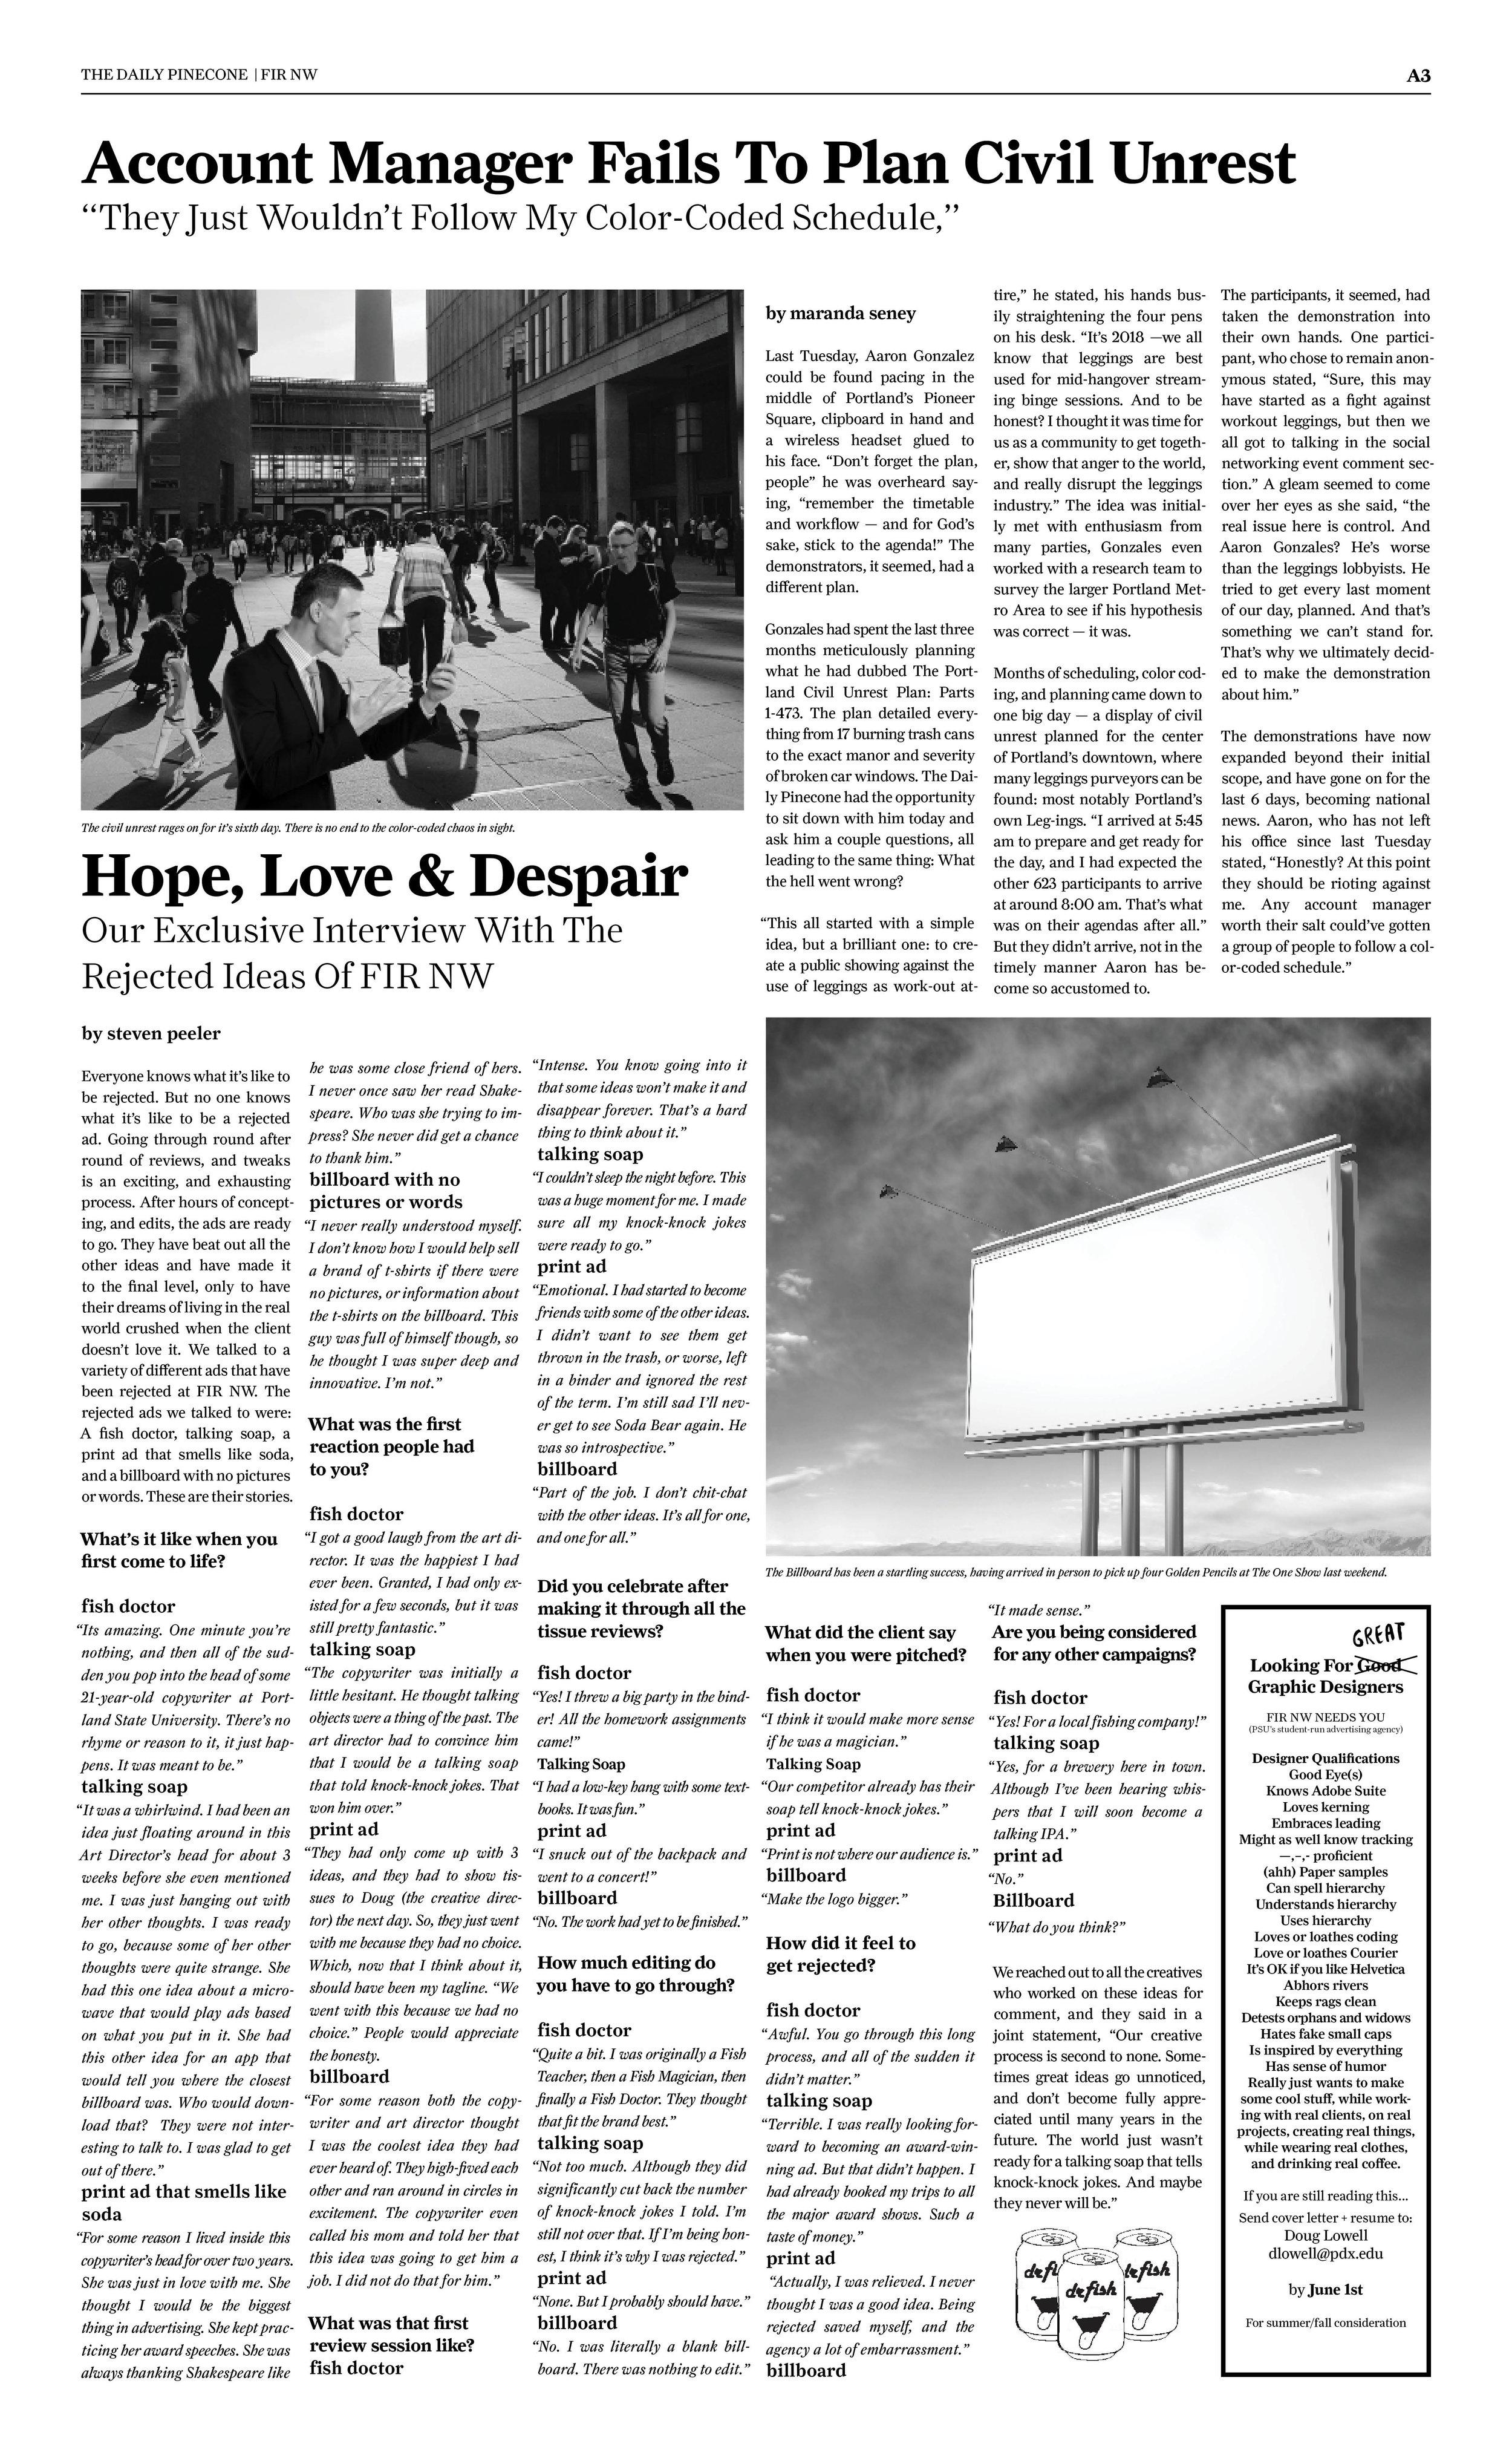 DailyPinecone_newspaper_r6 copy3.jpg